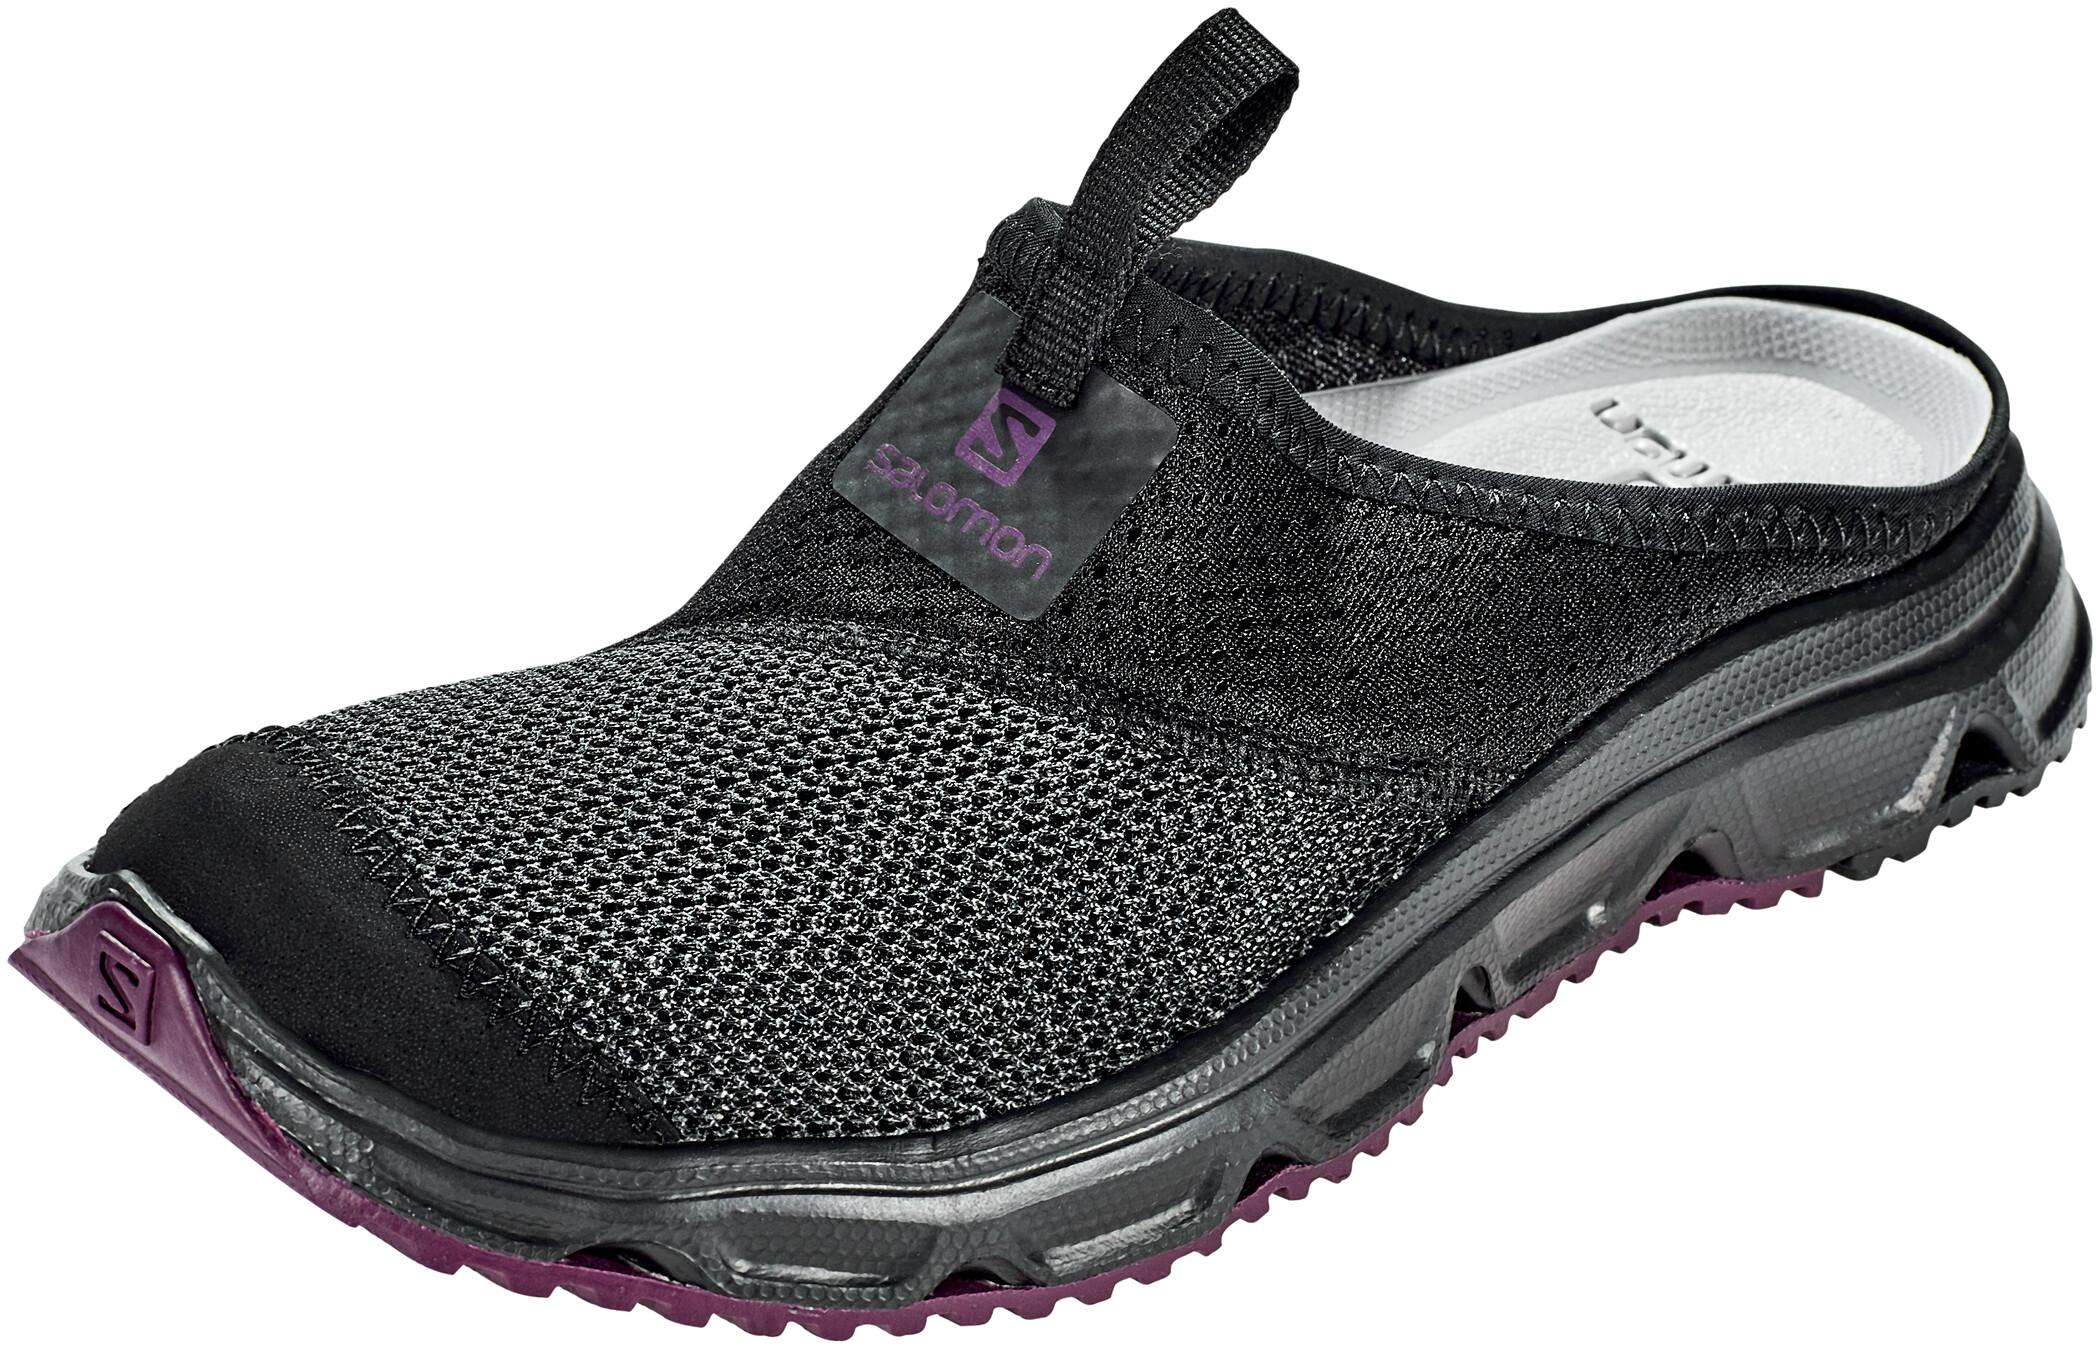 SALOMON Damen RX Travel W Schuhe Outdoor Wander Walking